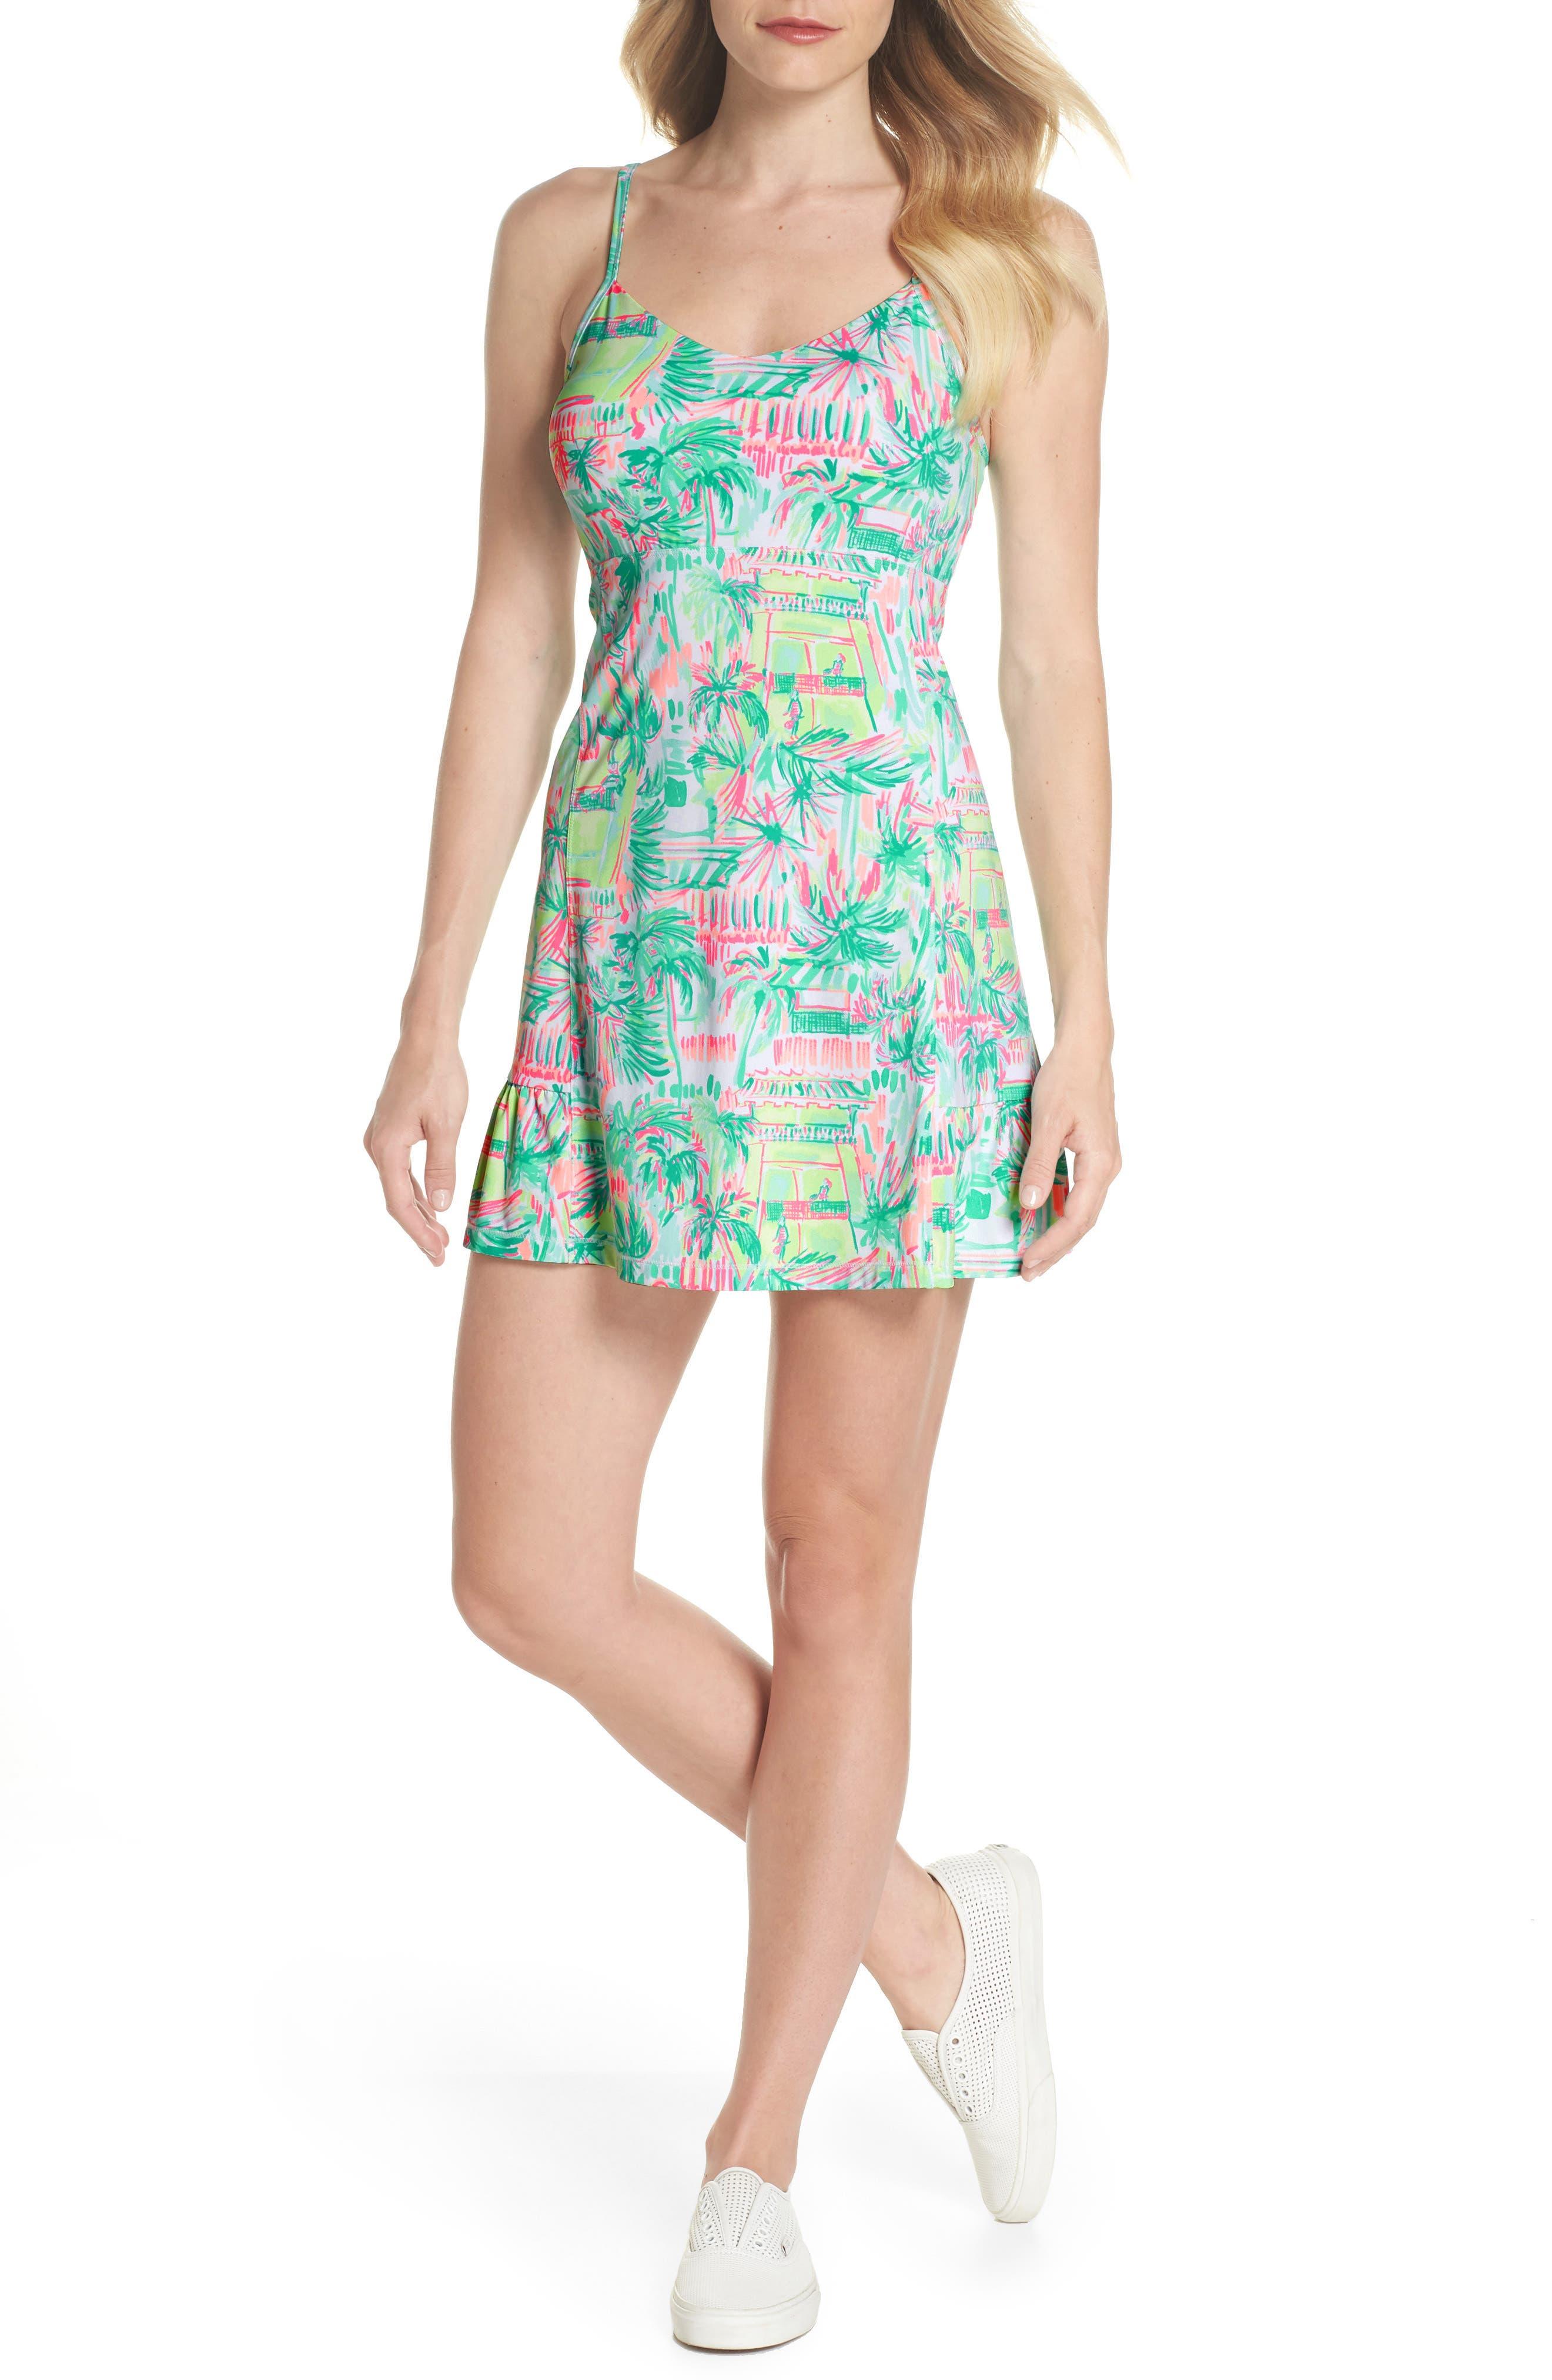 Adelia UPF 50+ Tennis Dress,                             Main thumbnail 1, color,                             MULTI PERFECT MATCH